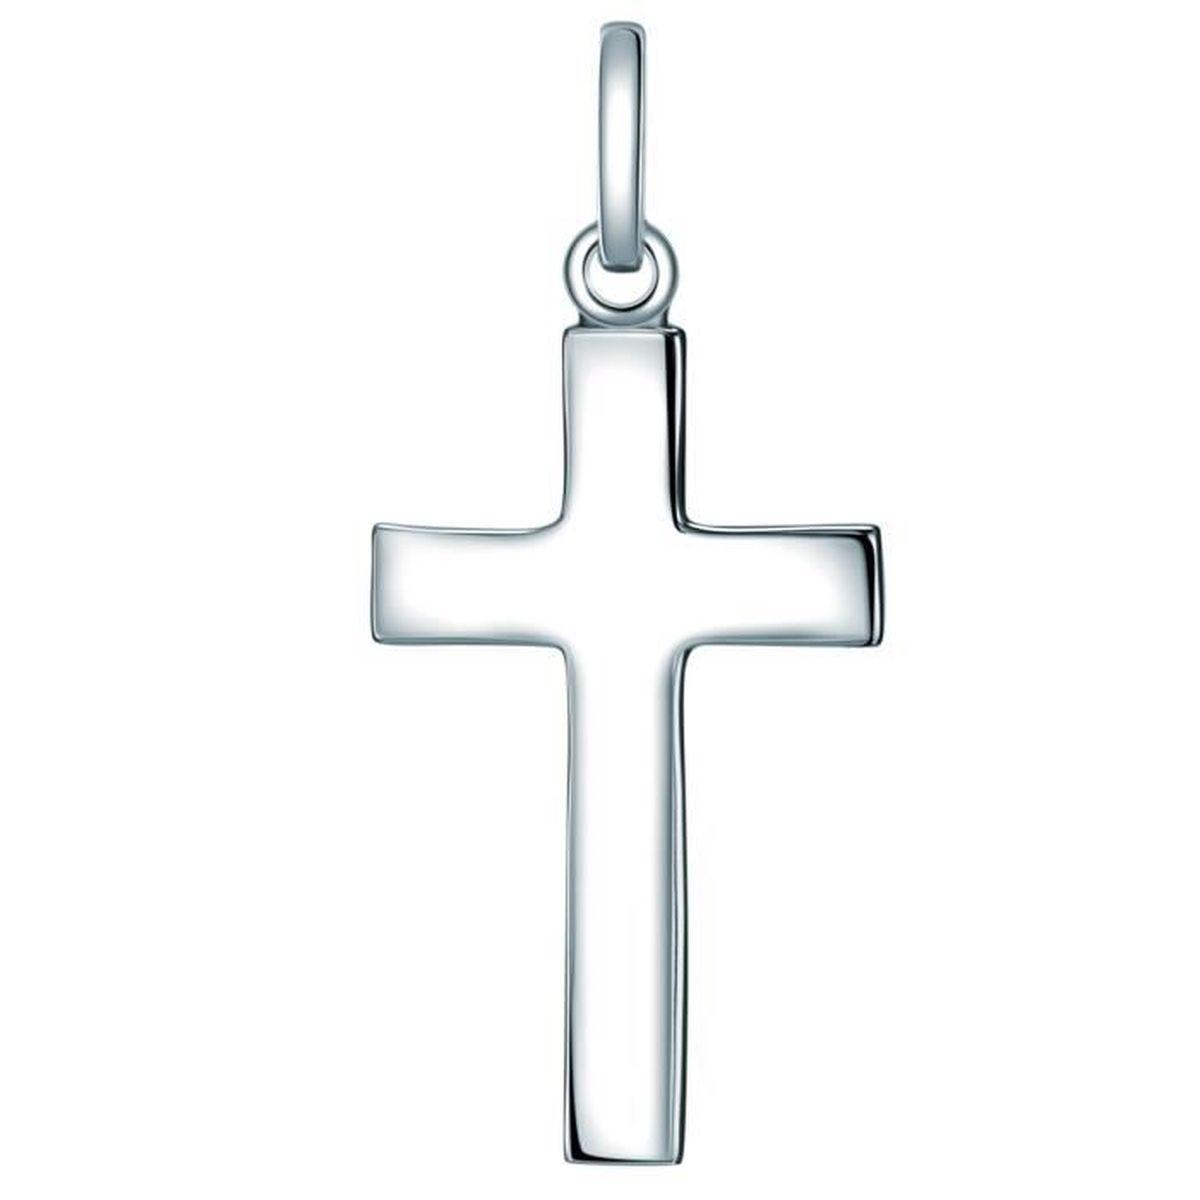 Bijoux Pendentif argent 925 petite croix 12 x 6 mm